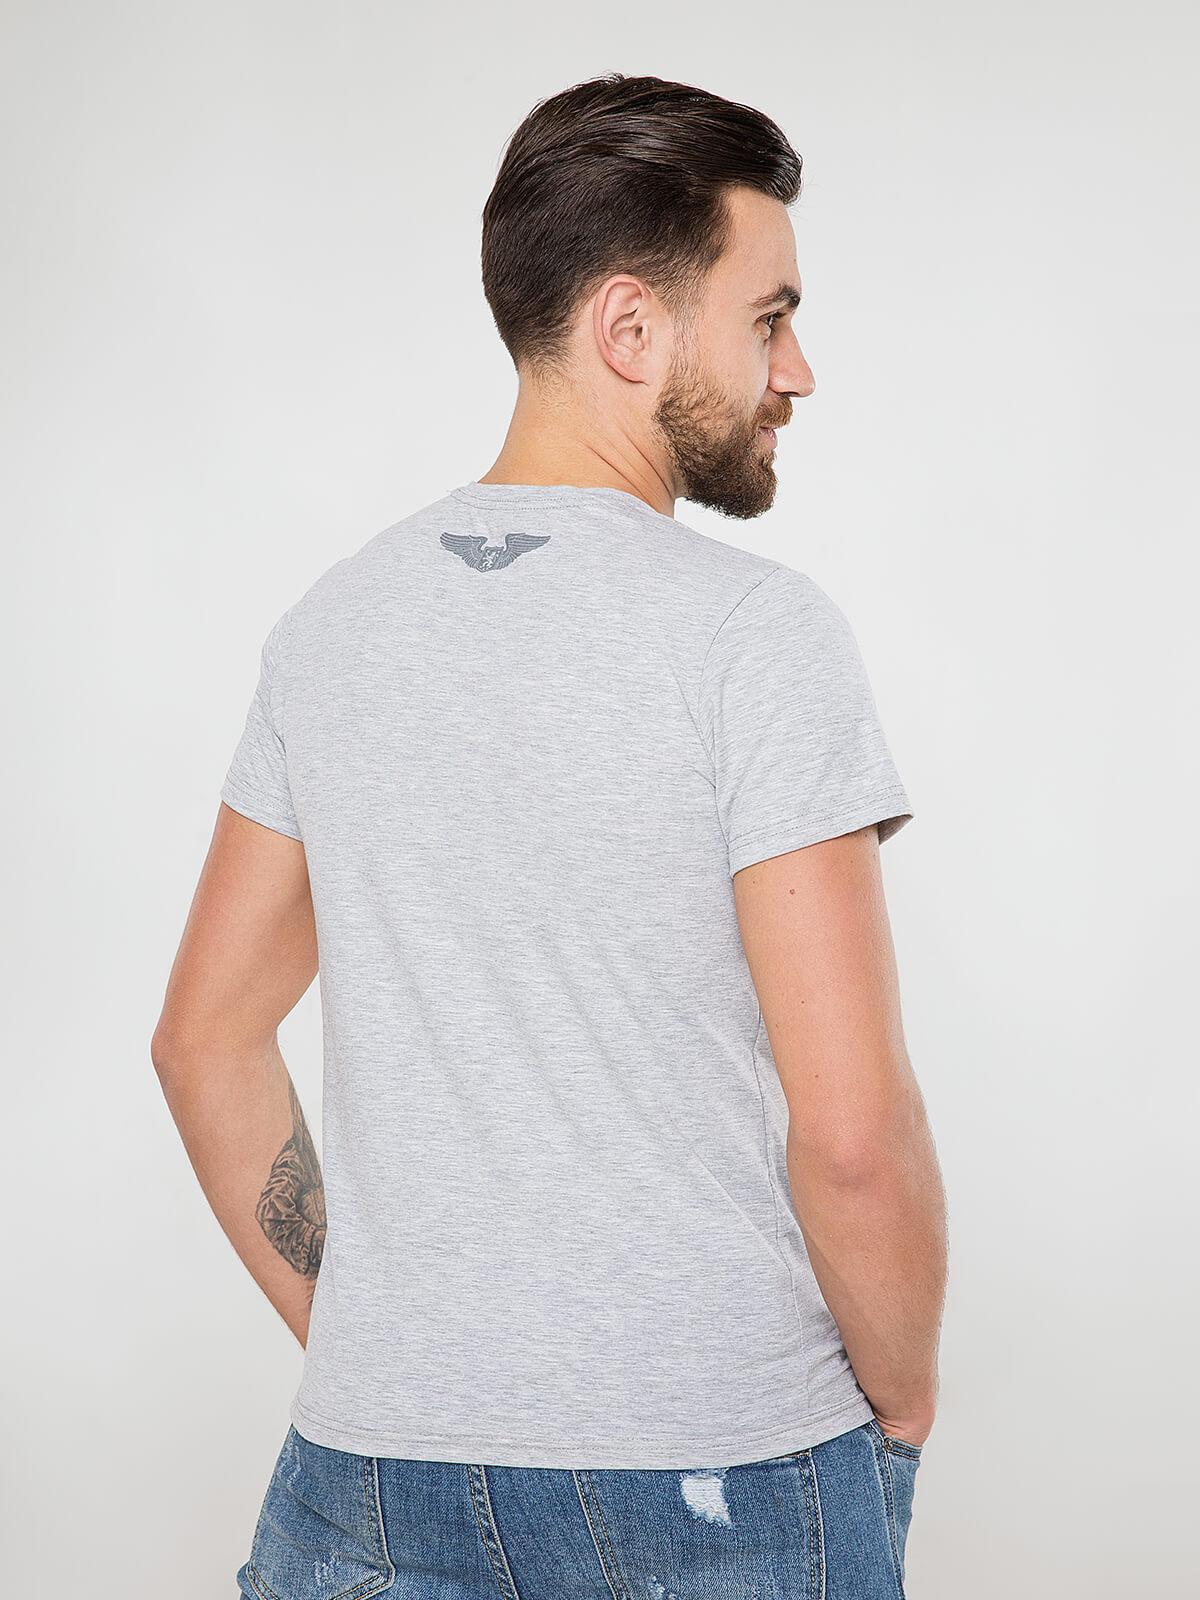 Men's T-Shirt Wjo Na Mars. Color gray.  Technique of prints applied: silkscreen printing.